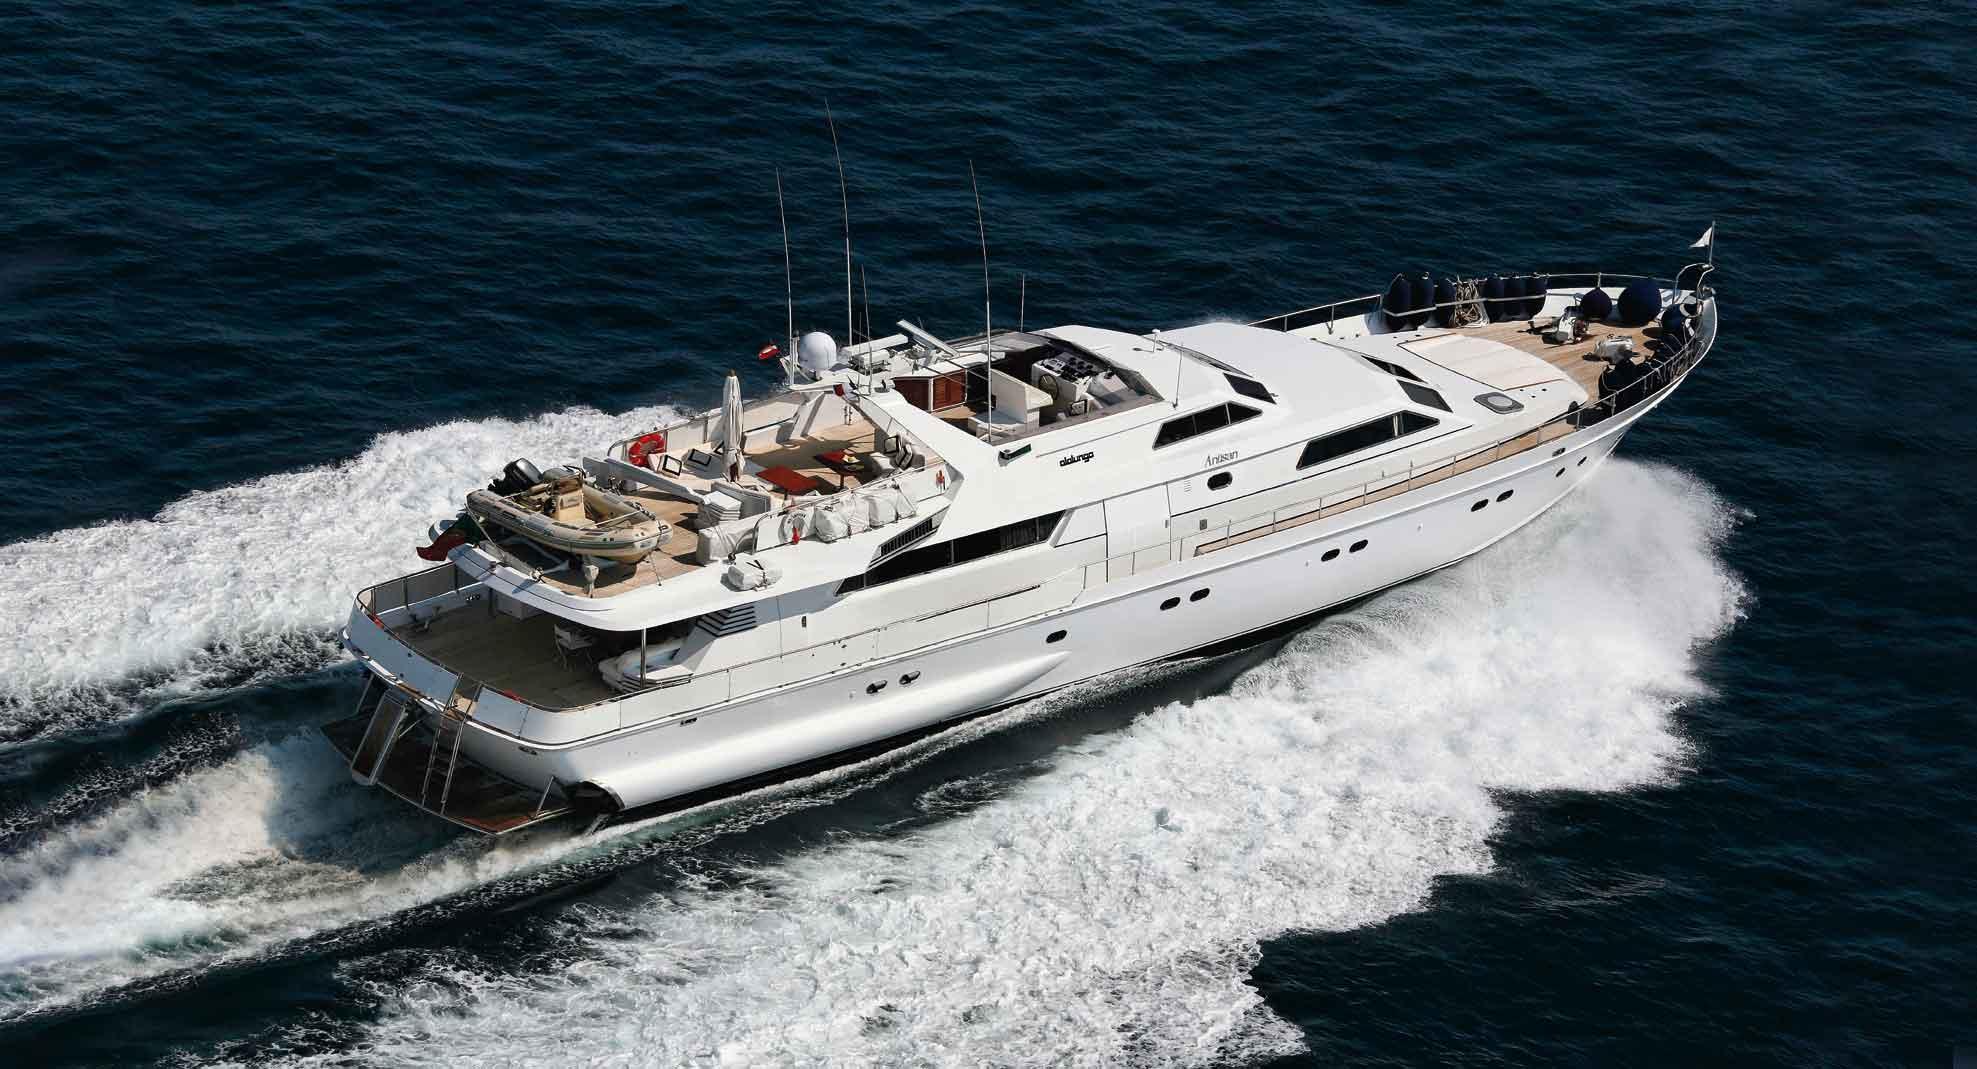 Alalunga <strong>Antisan -ex Laissez Faire - Lucky Fireball C - Shy Lady</strong> (Motor Yacht / Fly)